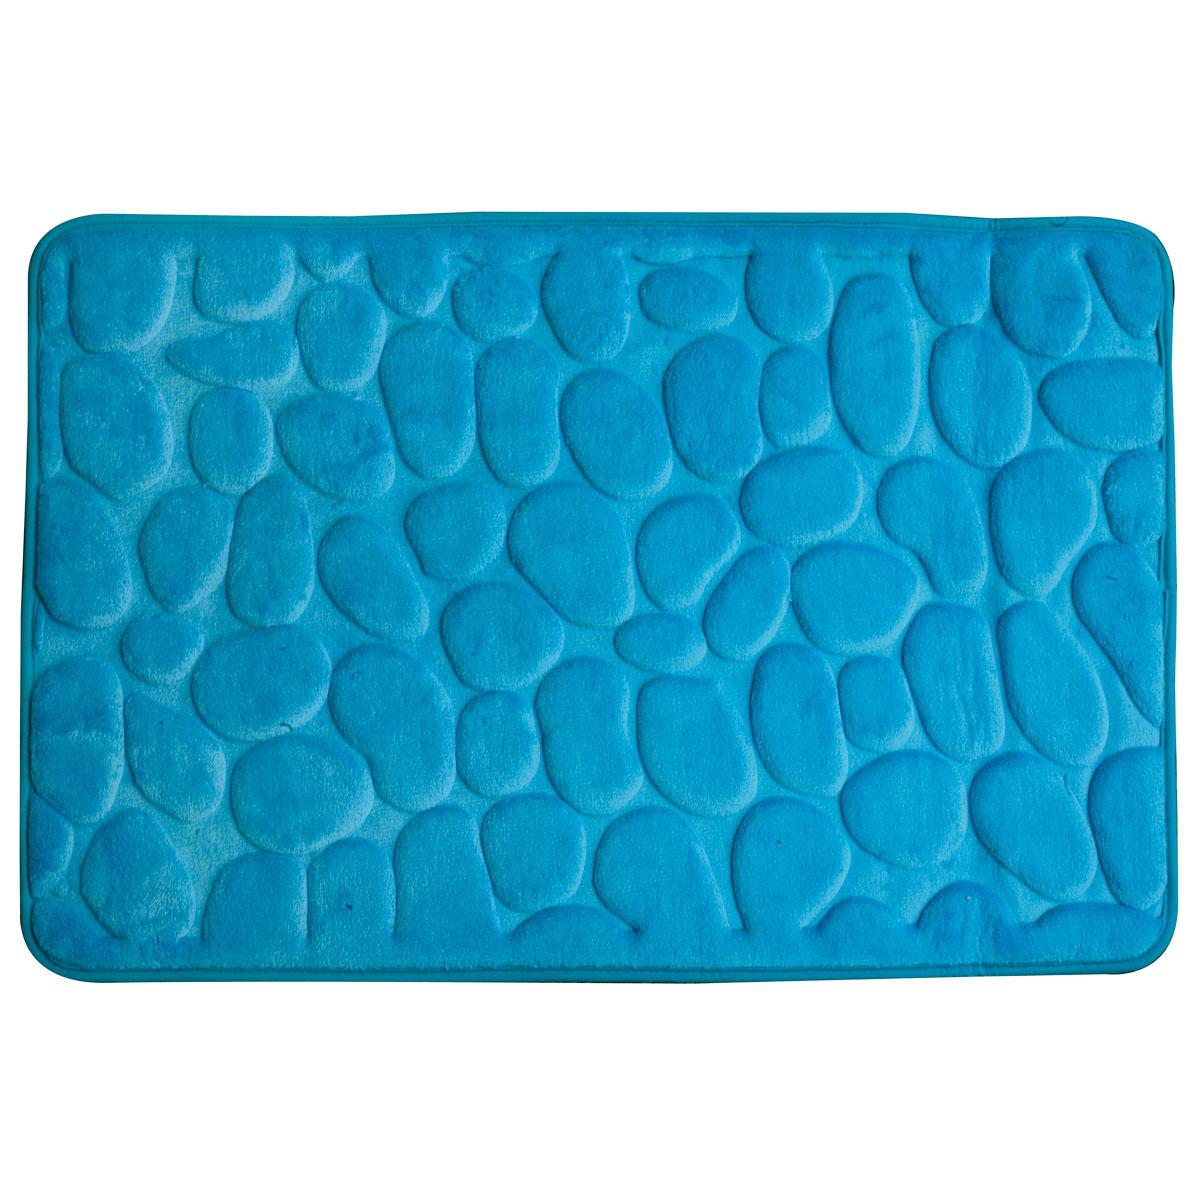 Super mäkká kúpeľňa koberec 60x95 3D tyrkysové